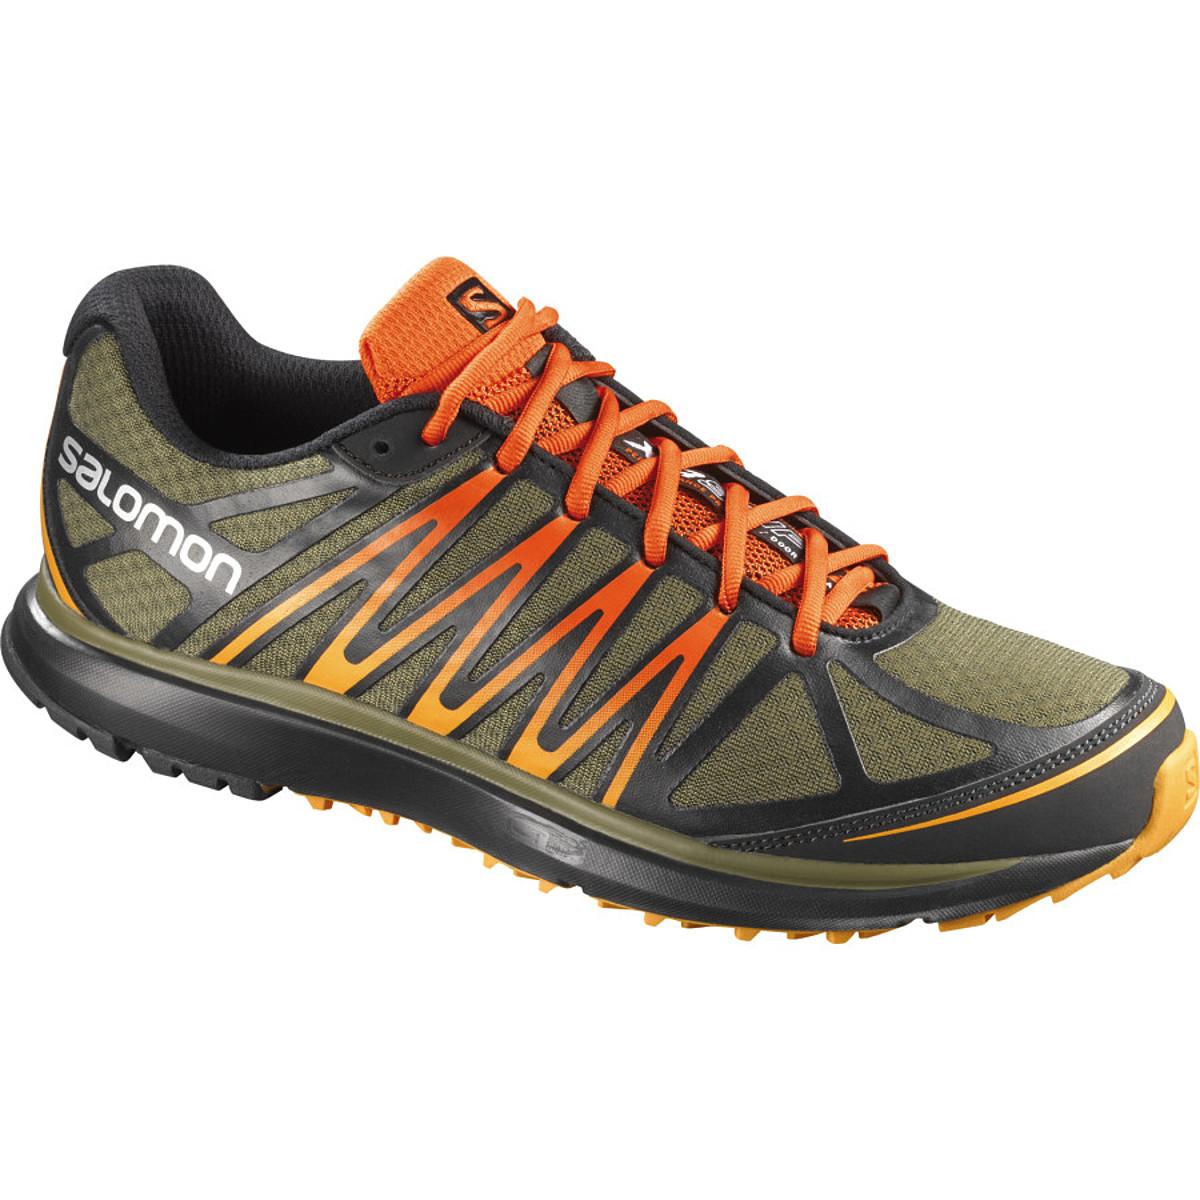 photo: Salomon Men's X-Tour trail running shoe